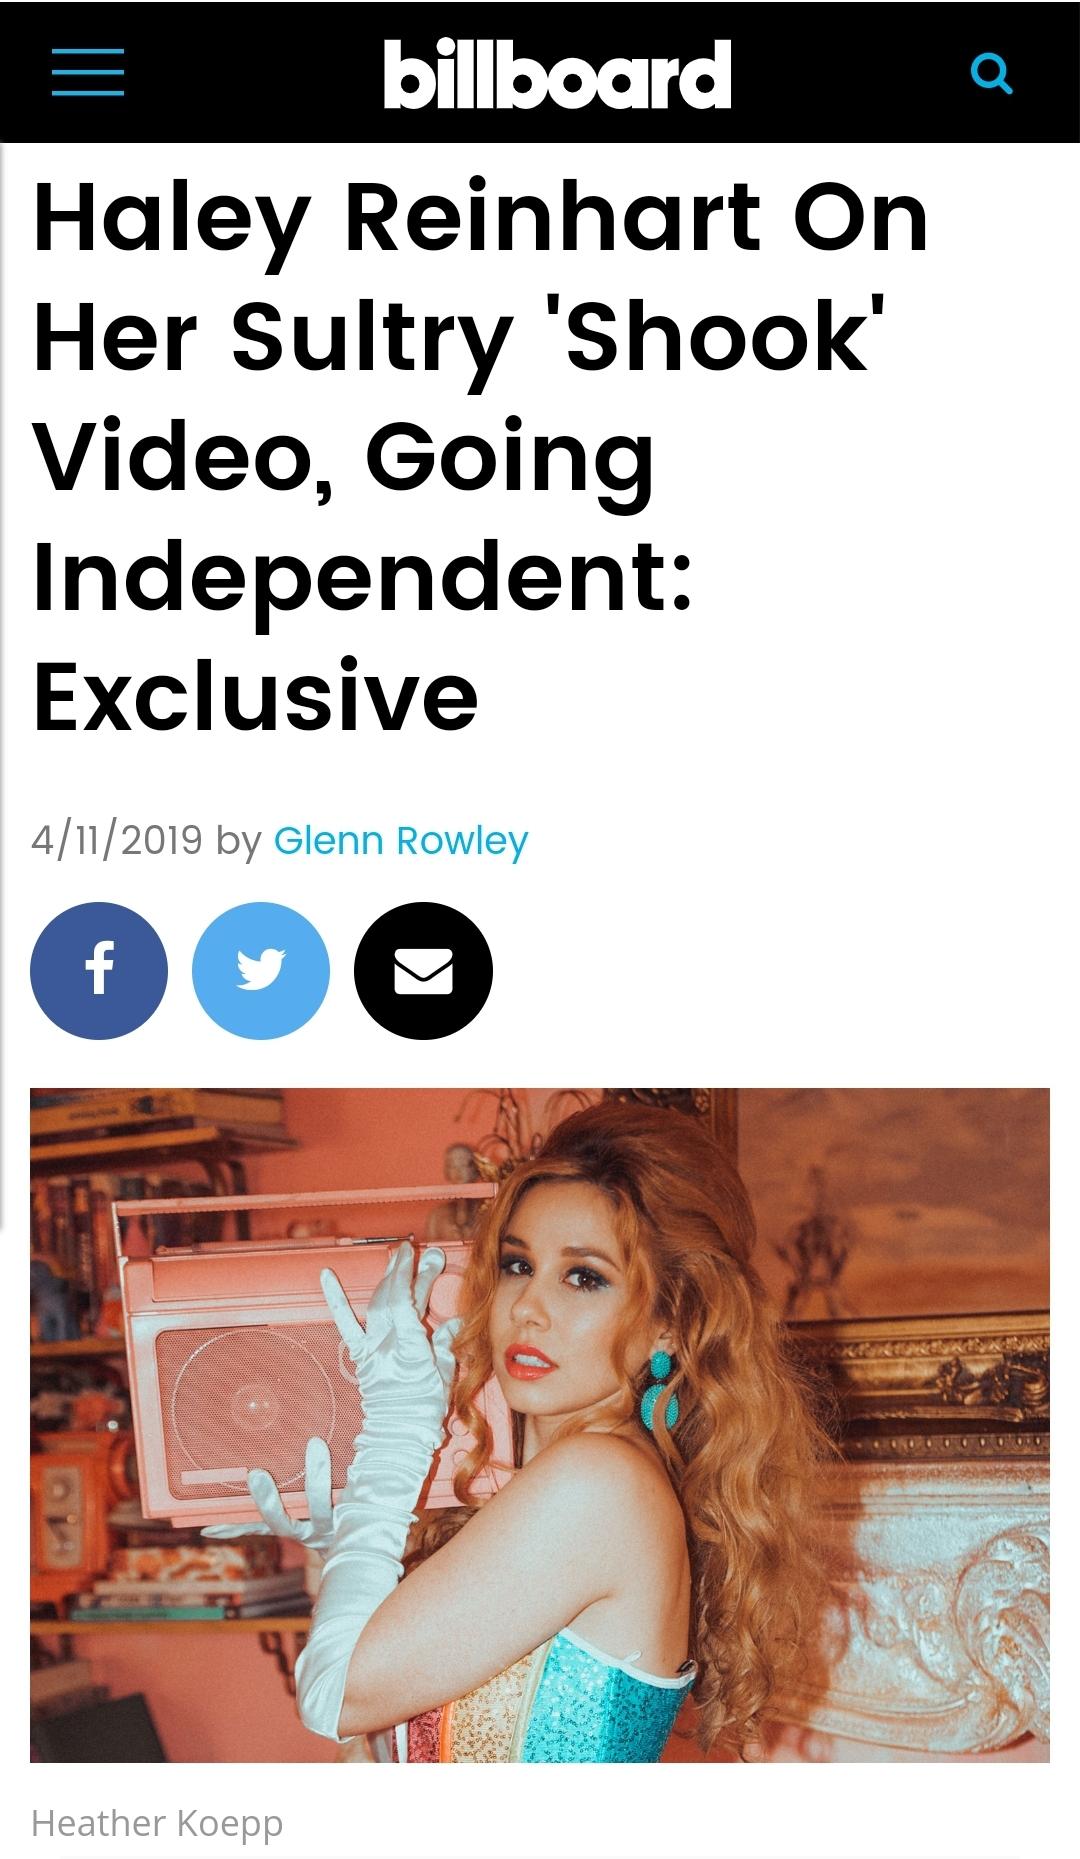 Billboard - https://www.billboard.com/articles/columns/pop/8506455/haley-reinhart-interview-shook-video